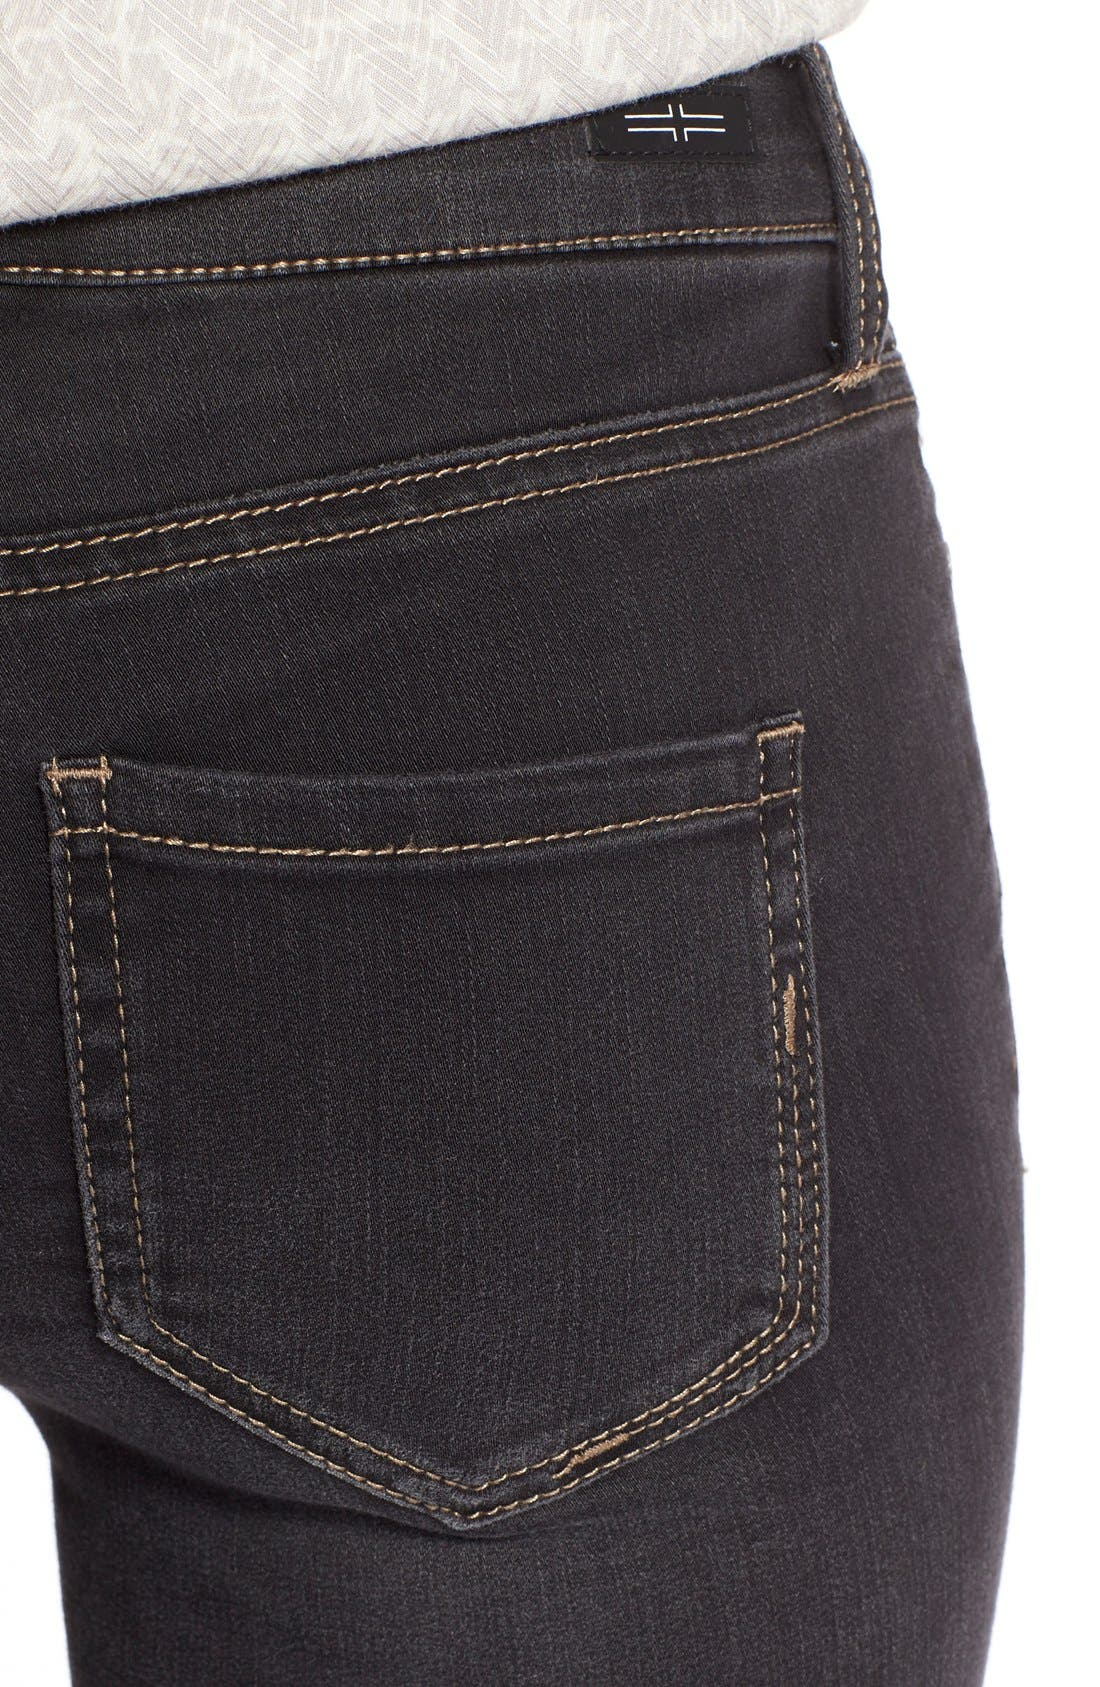 Abby StretchSkinny Jeans,                             Alternate thumbnail 4, color,                             Sulphur